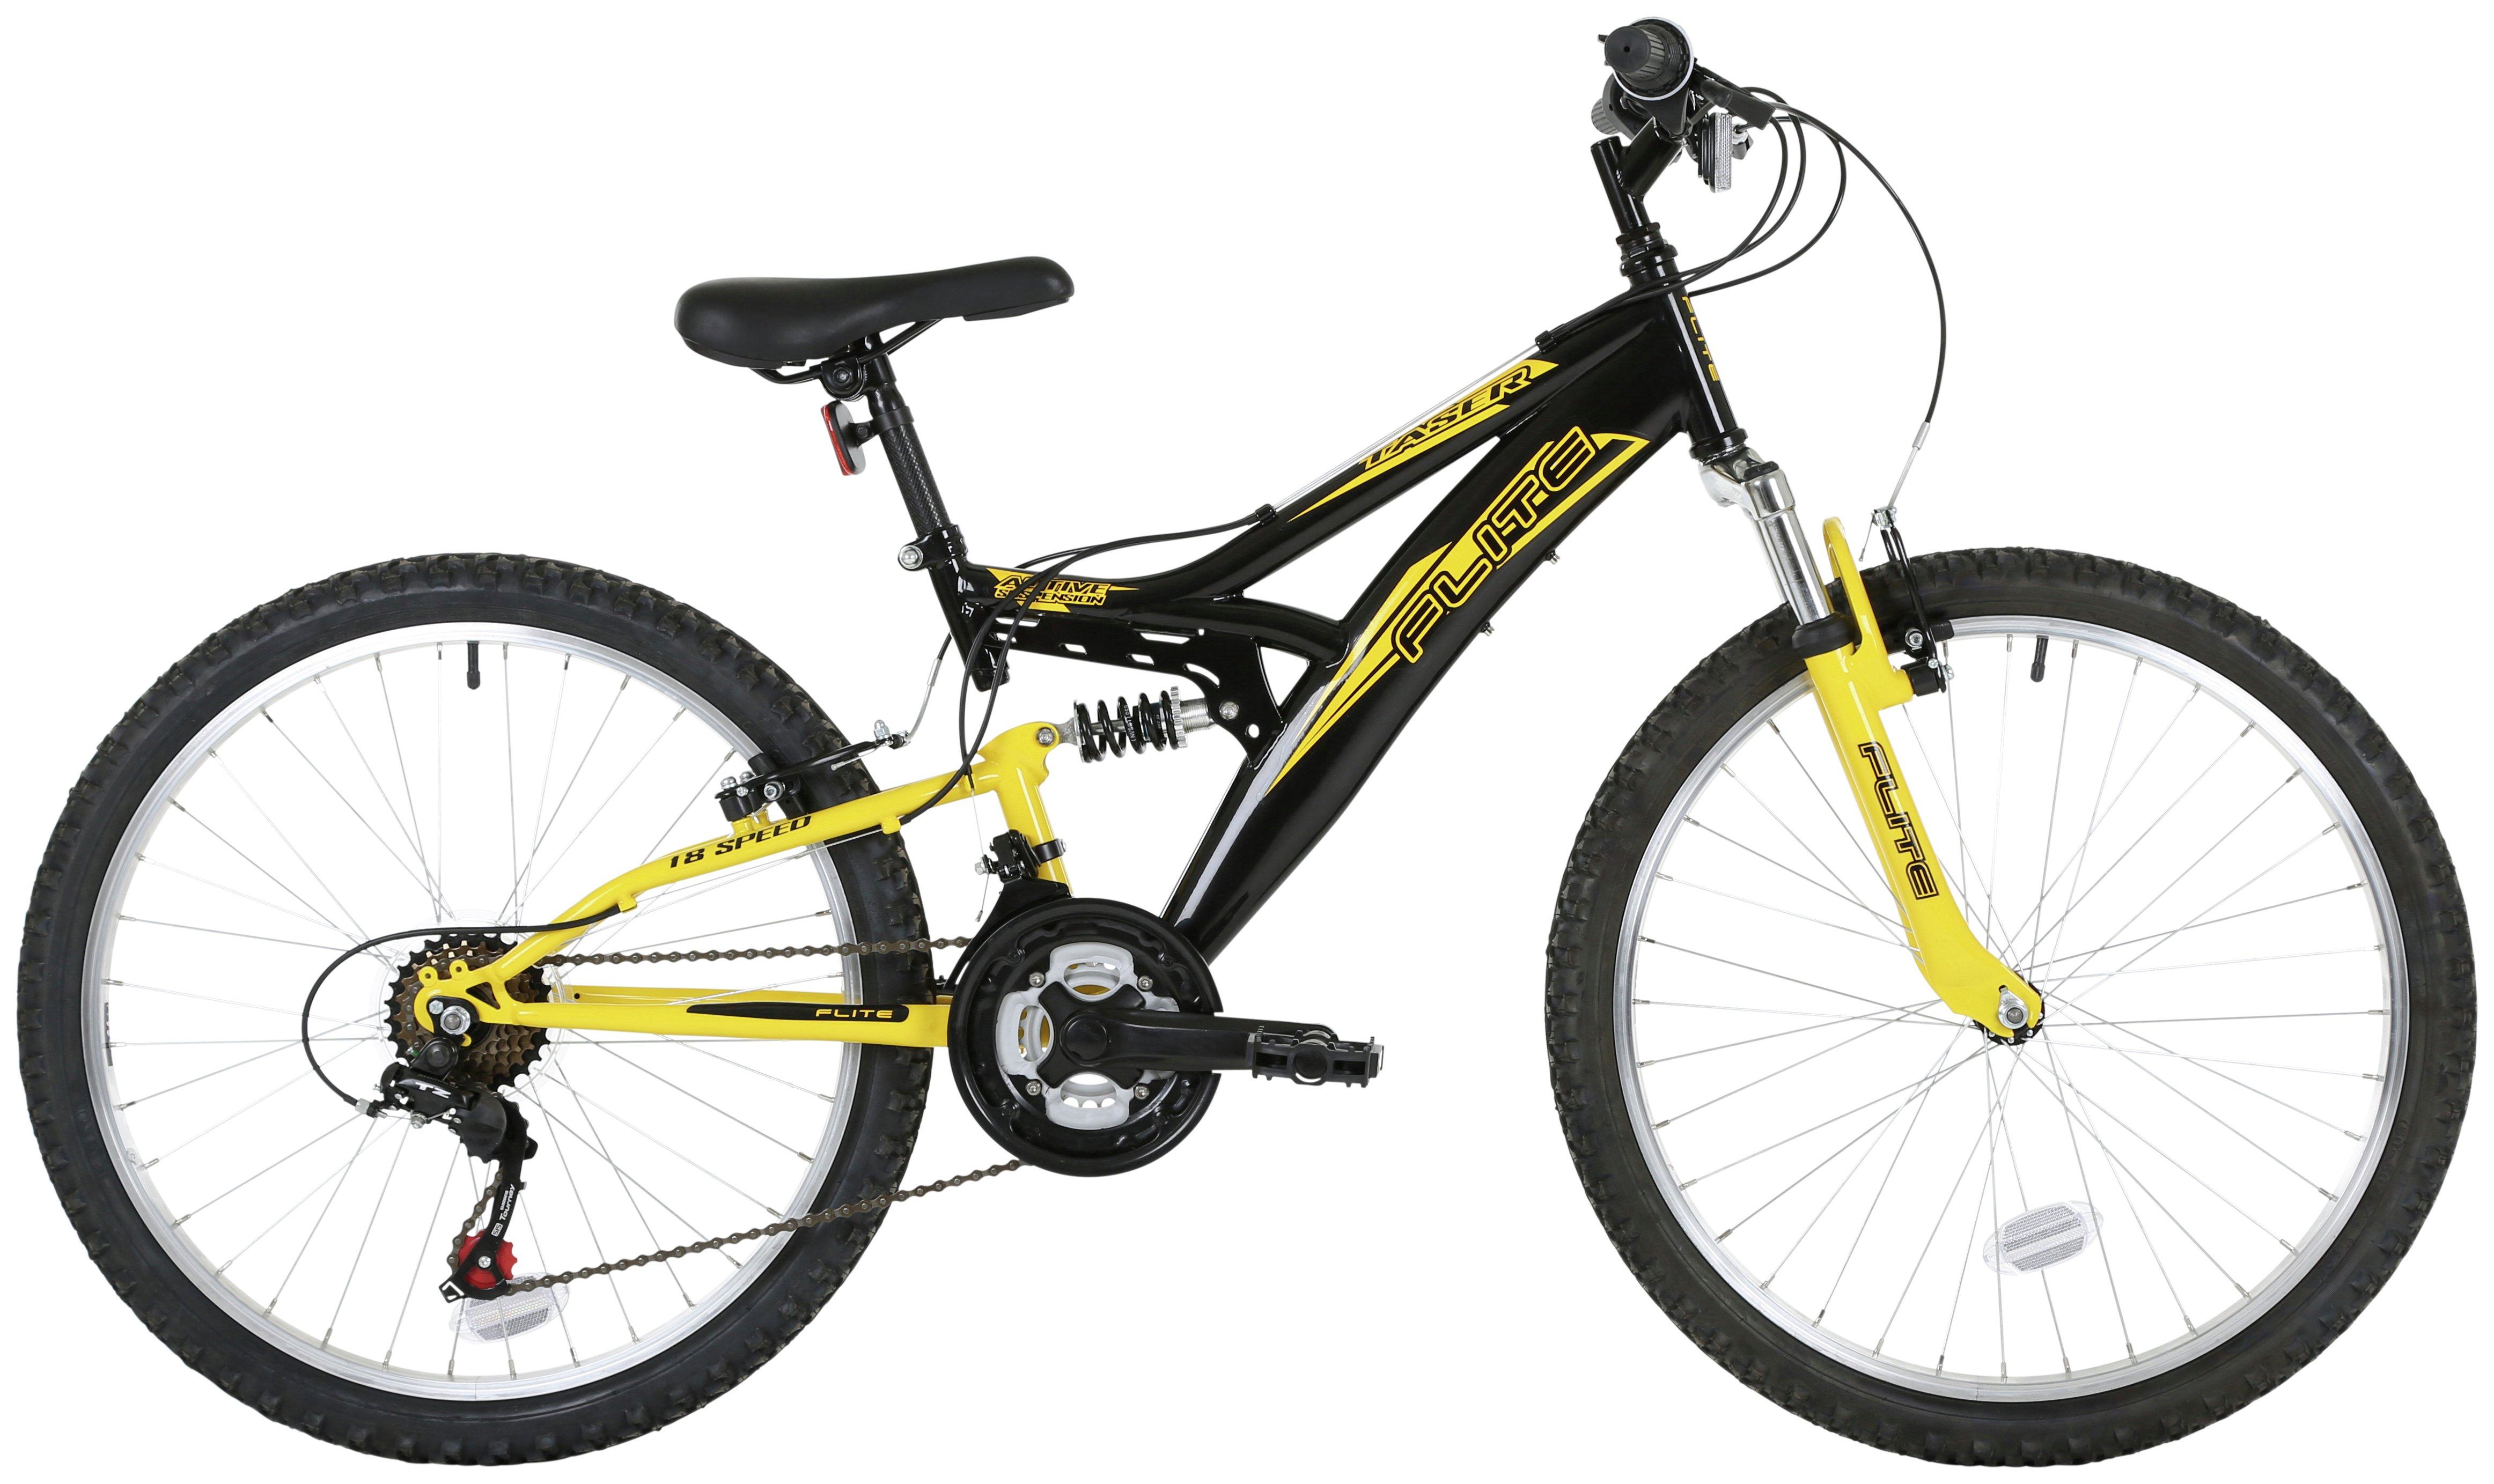 Flite Taser 14 Inch Dual Suspension Bike - Boys